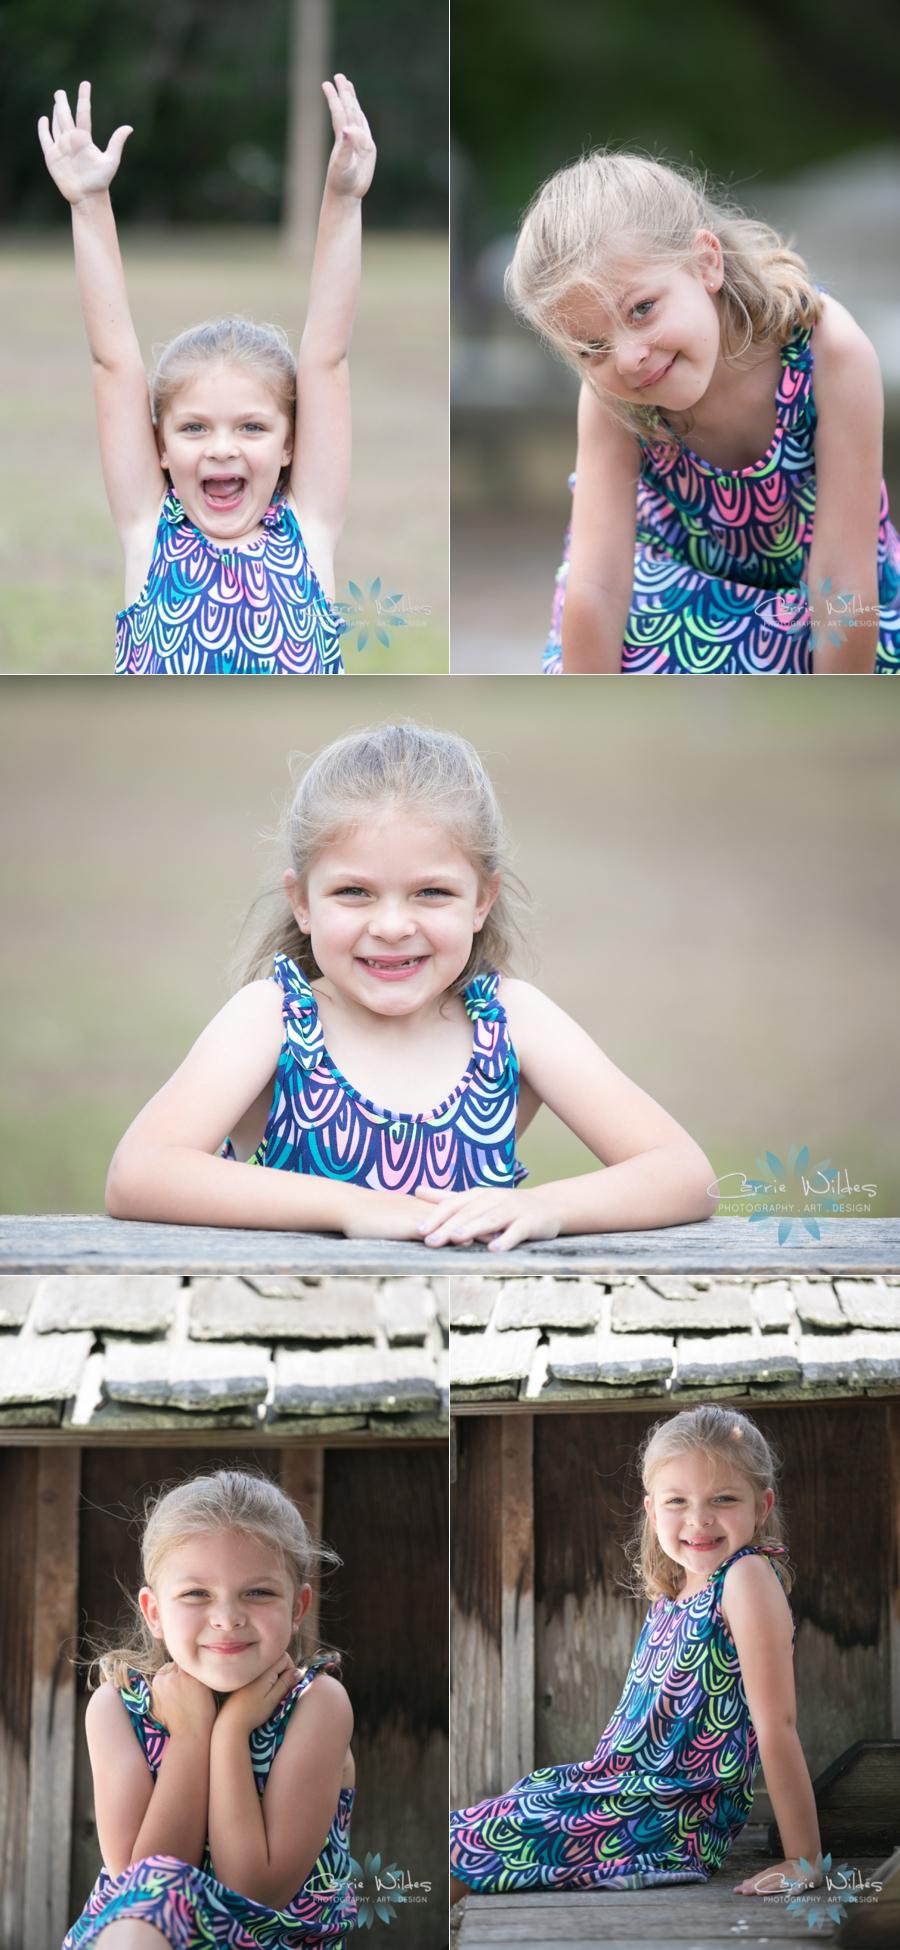 5_3_17 Sophie Sarasota Childrens Portraits_0001.jpg